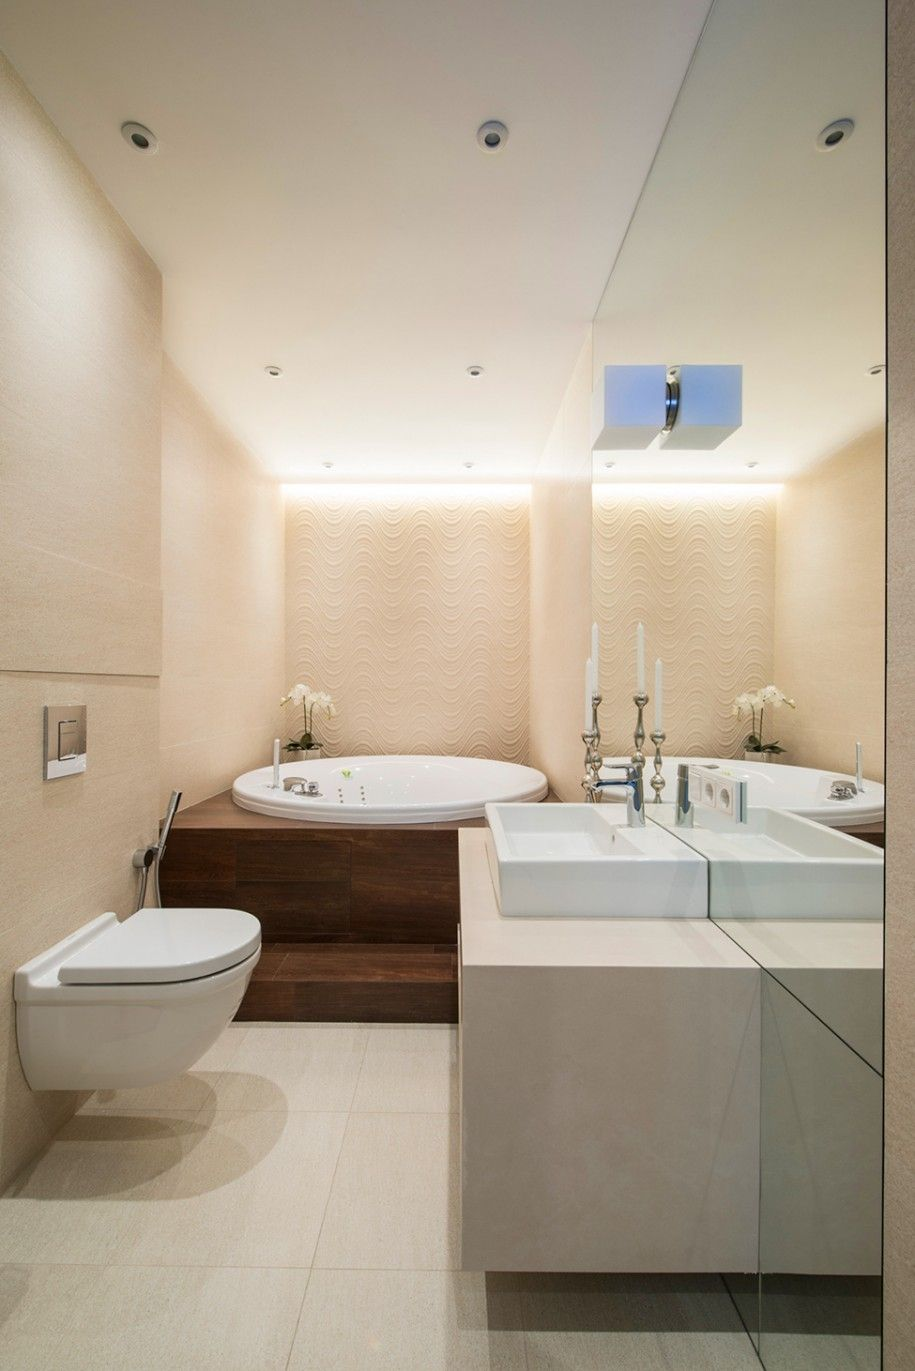 Simple Toilet And Bathroom Interior Design Modern